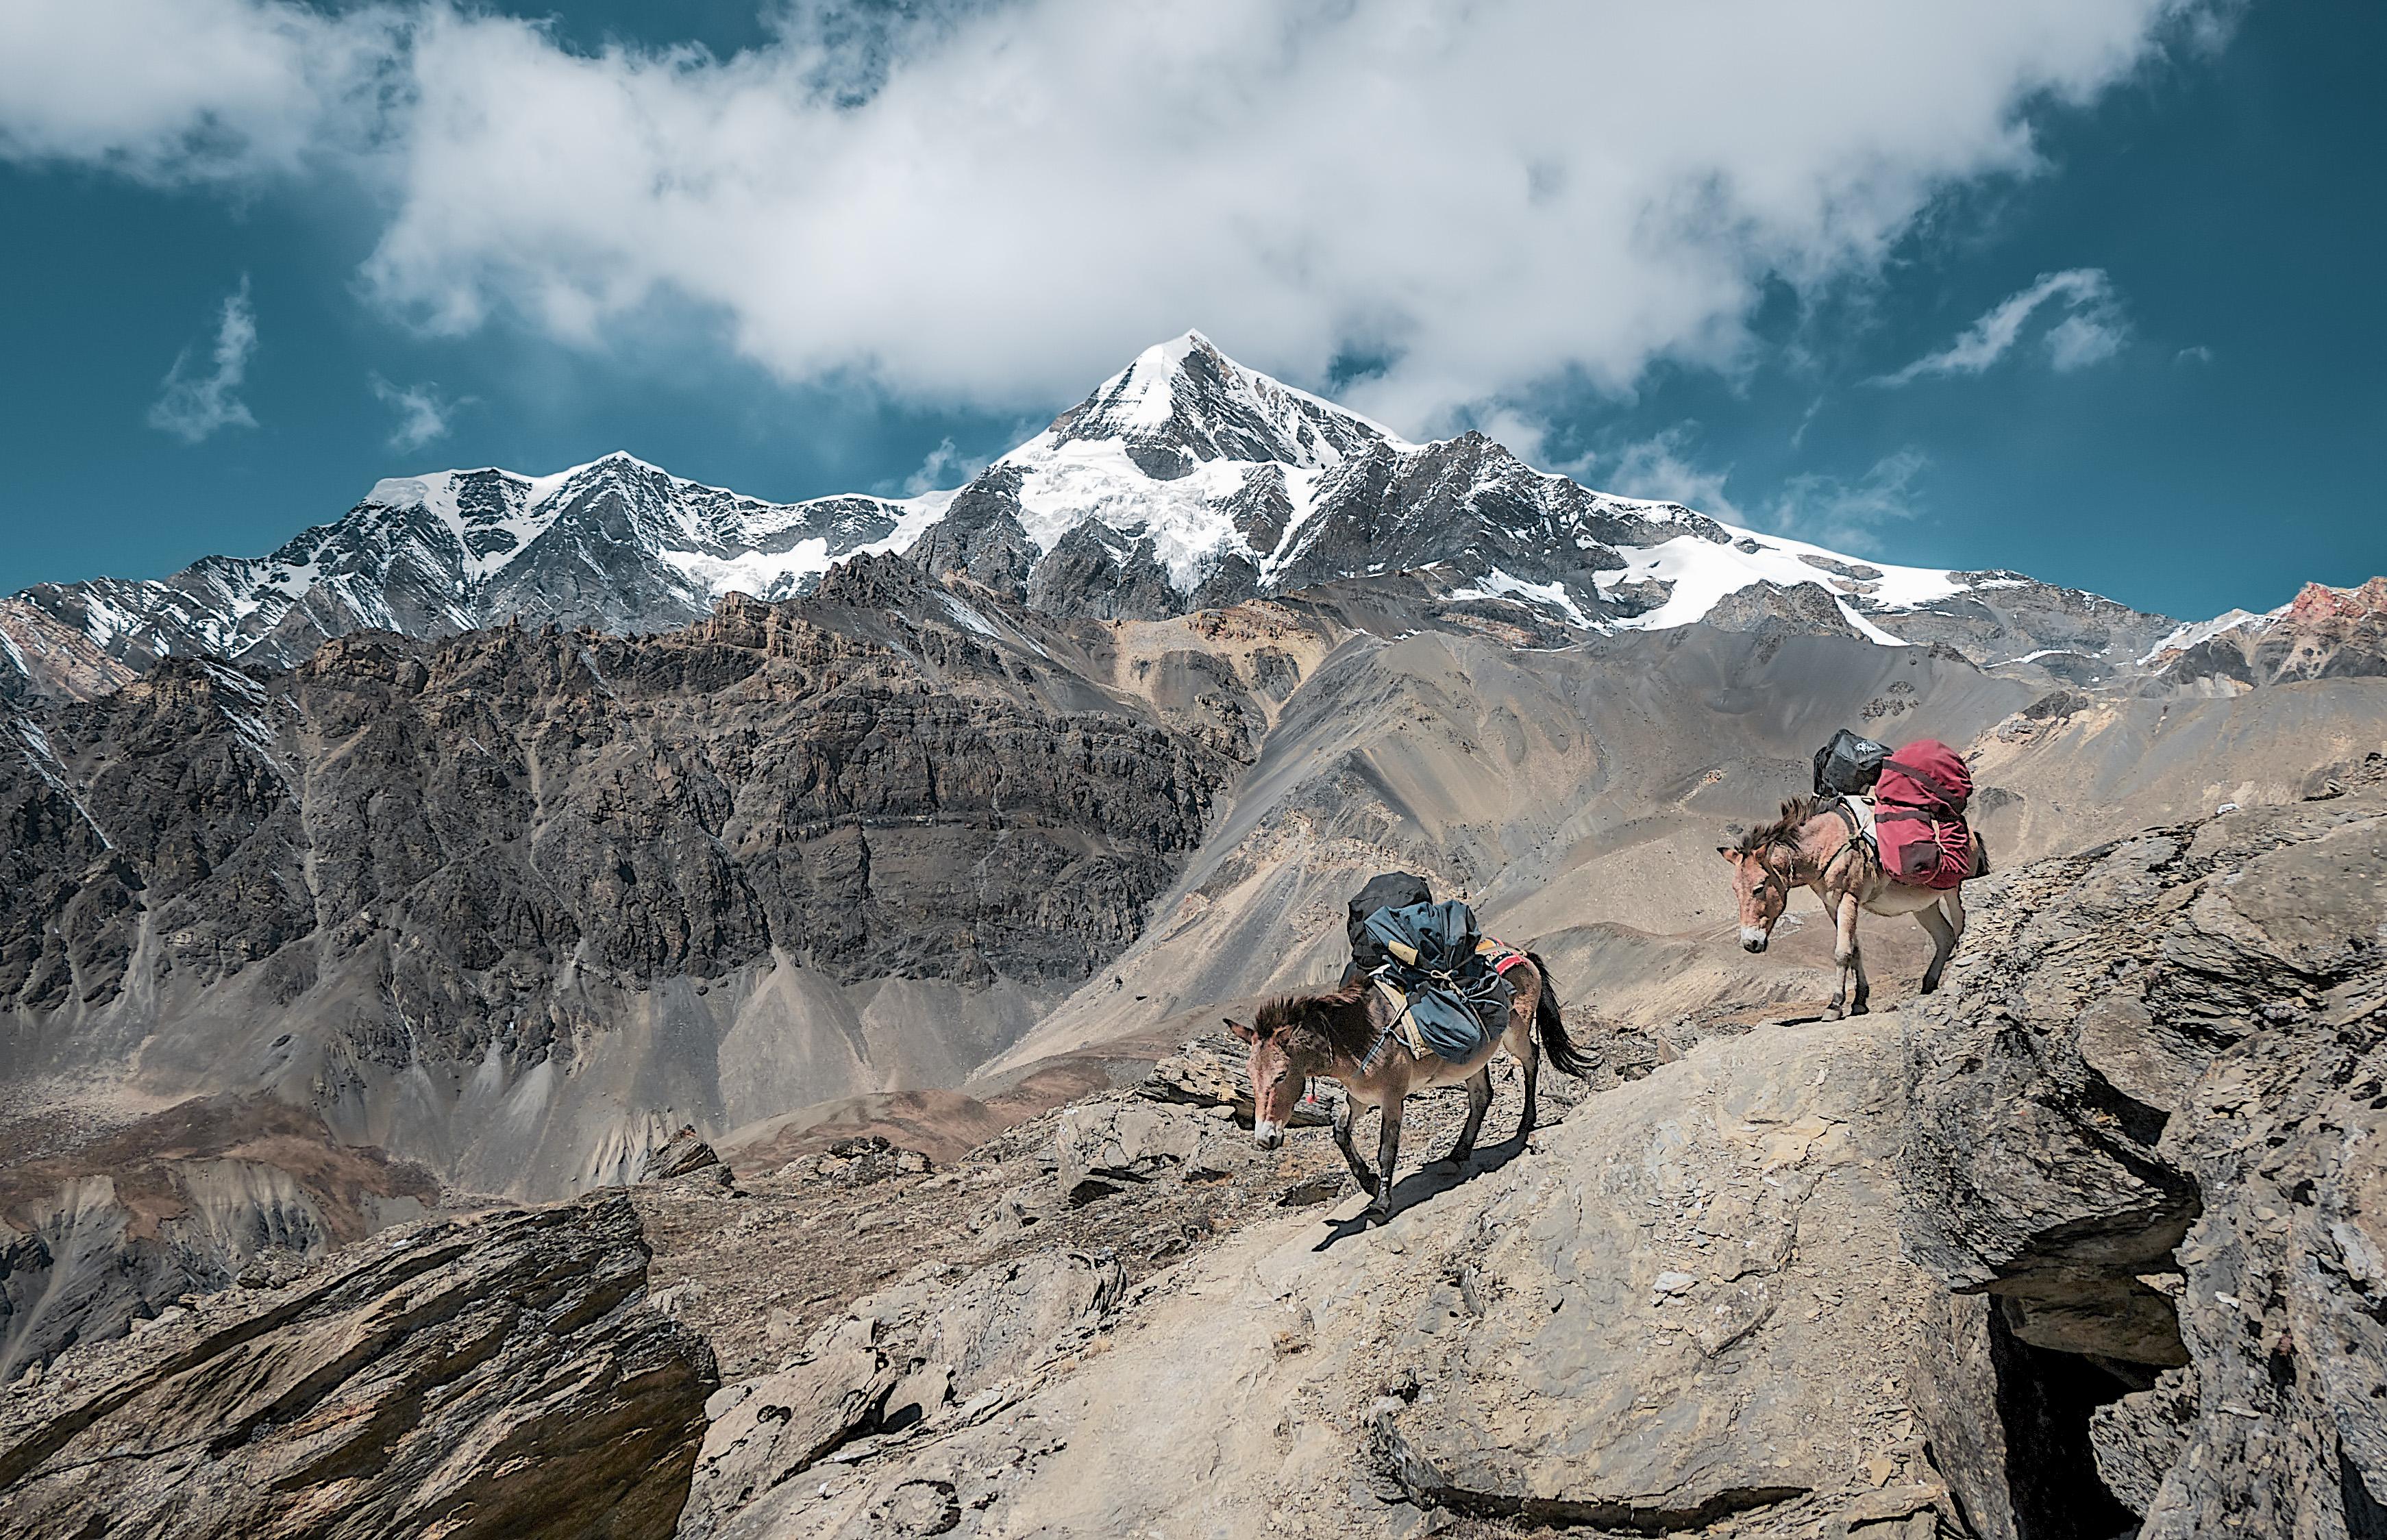 Let´s go hiking., Asia, Landscape, Mountain, Mountainside, HQ Photo